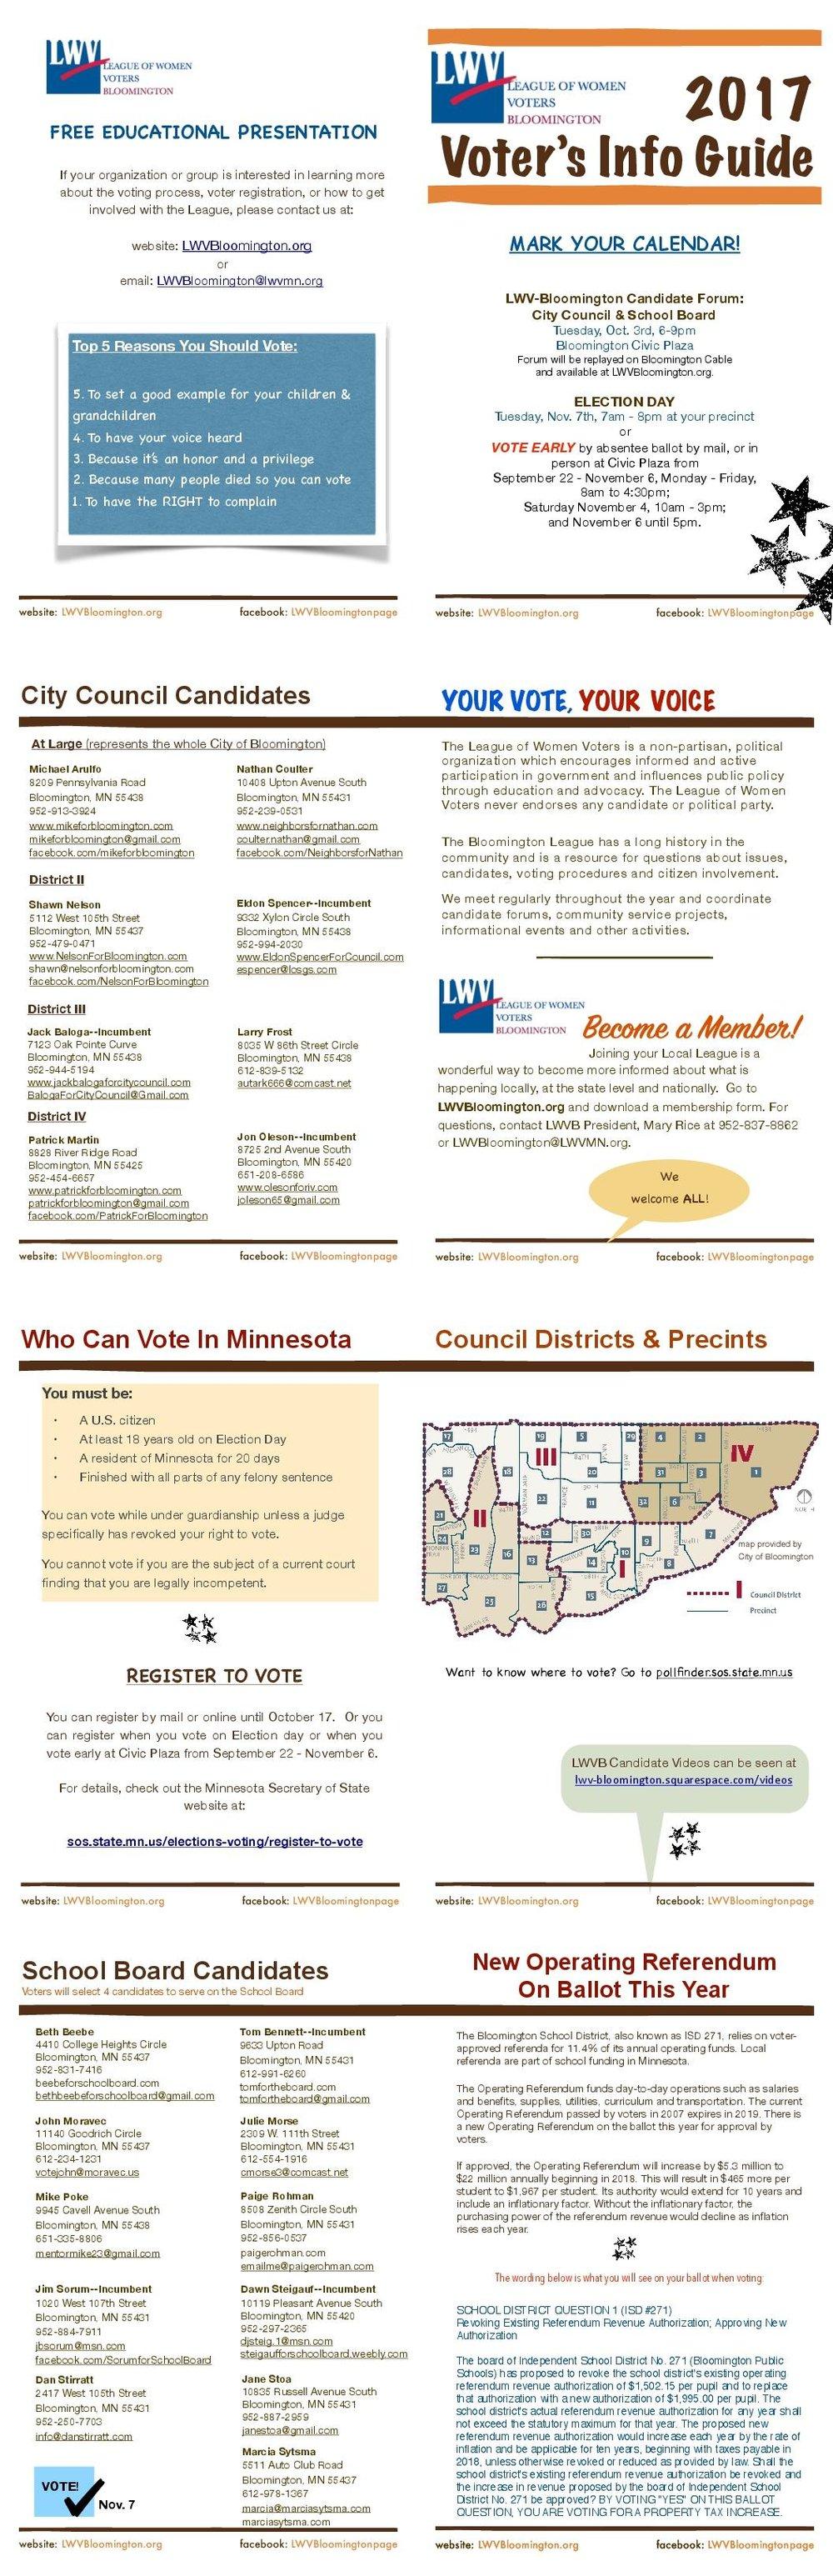 Voter's Guide (print)--2017 copy final version for reprint 9.17.jpg